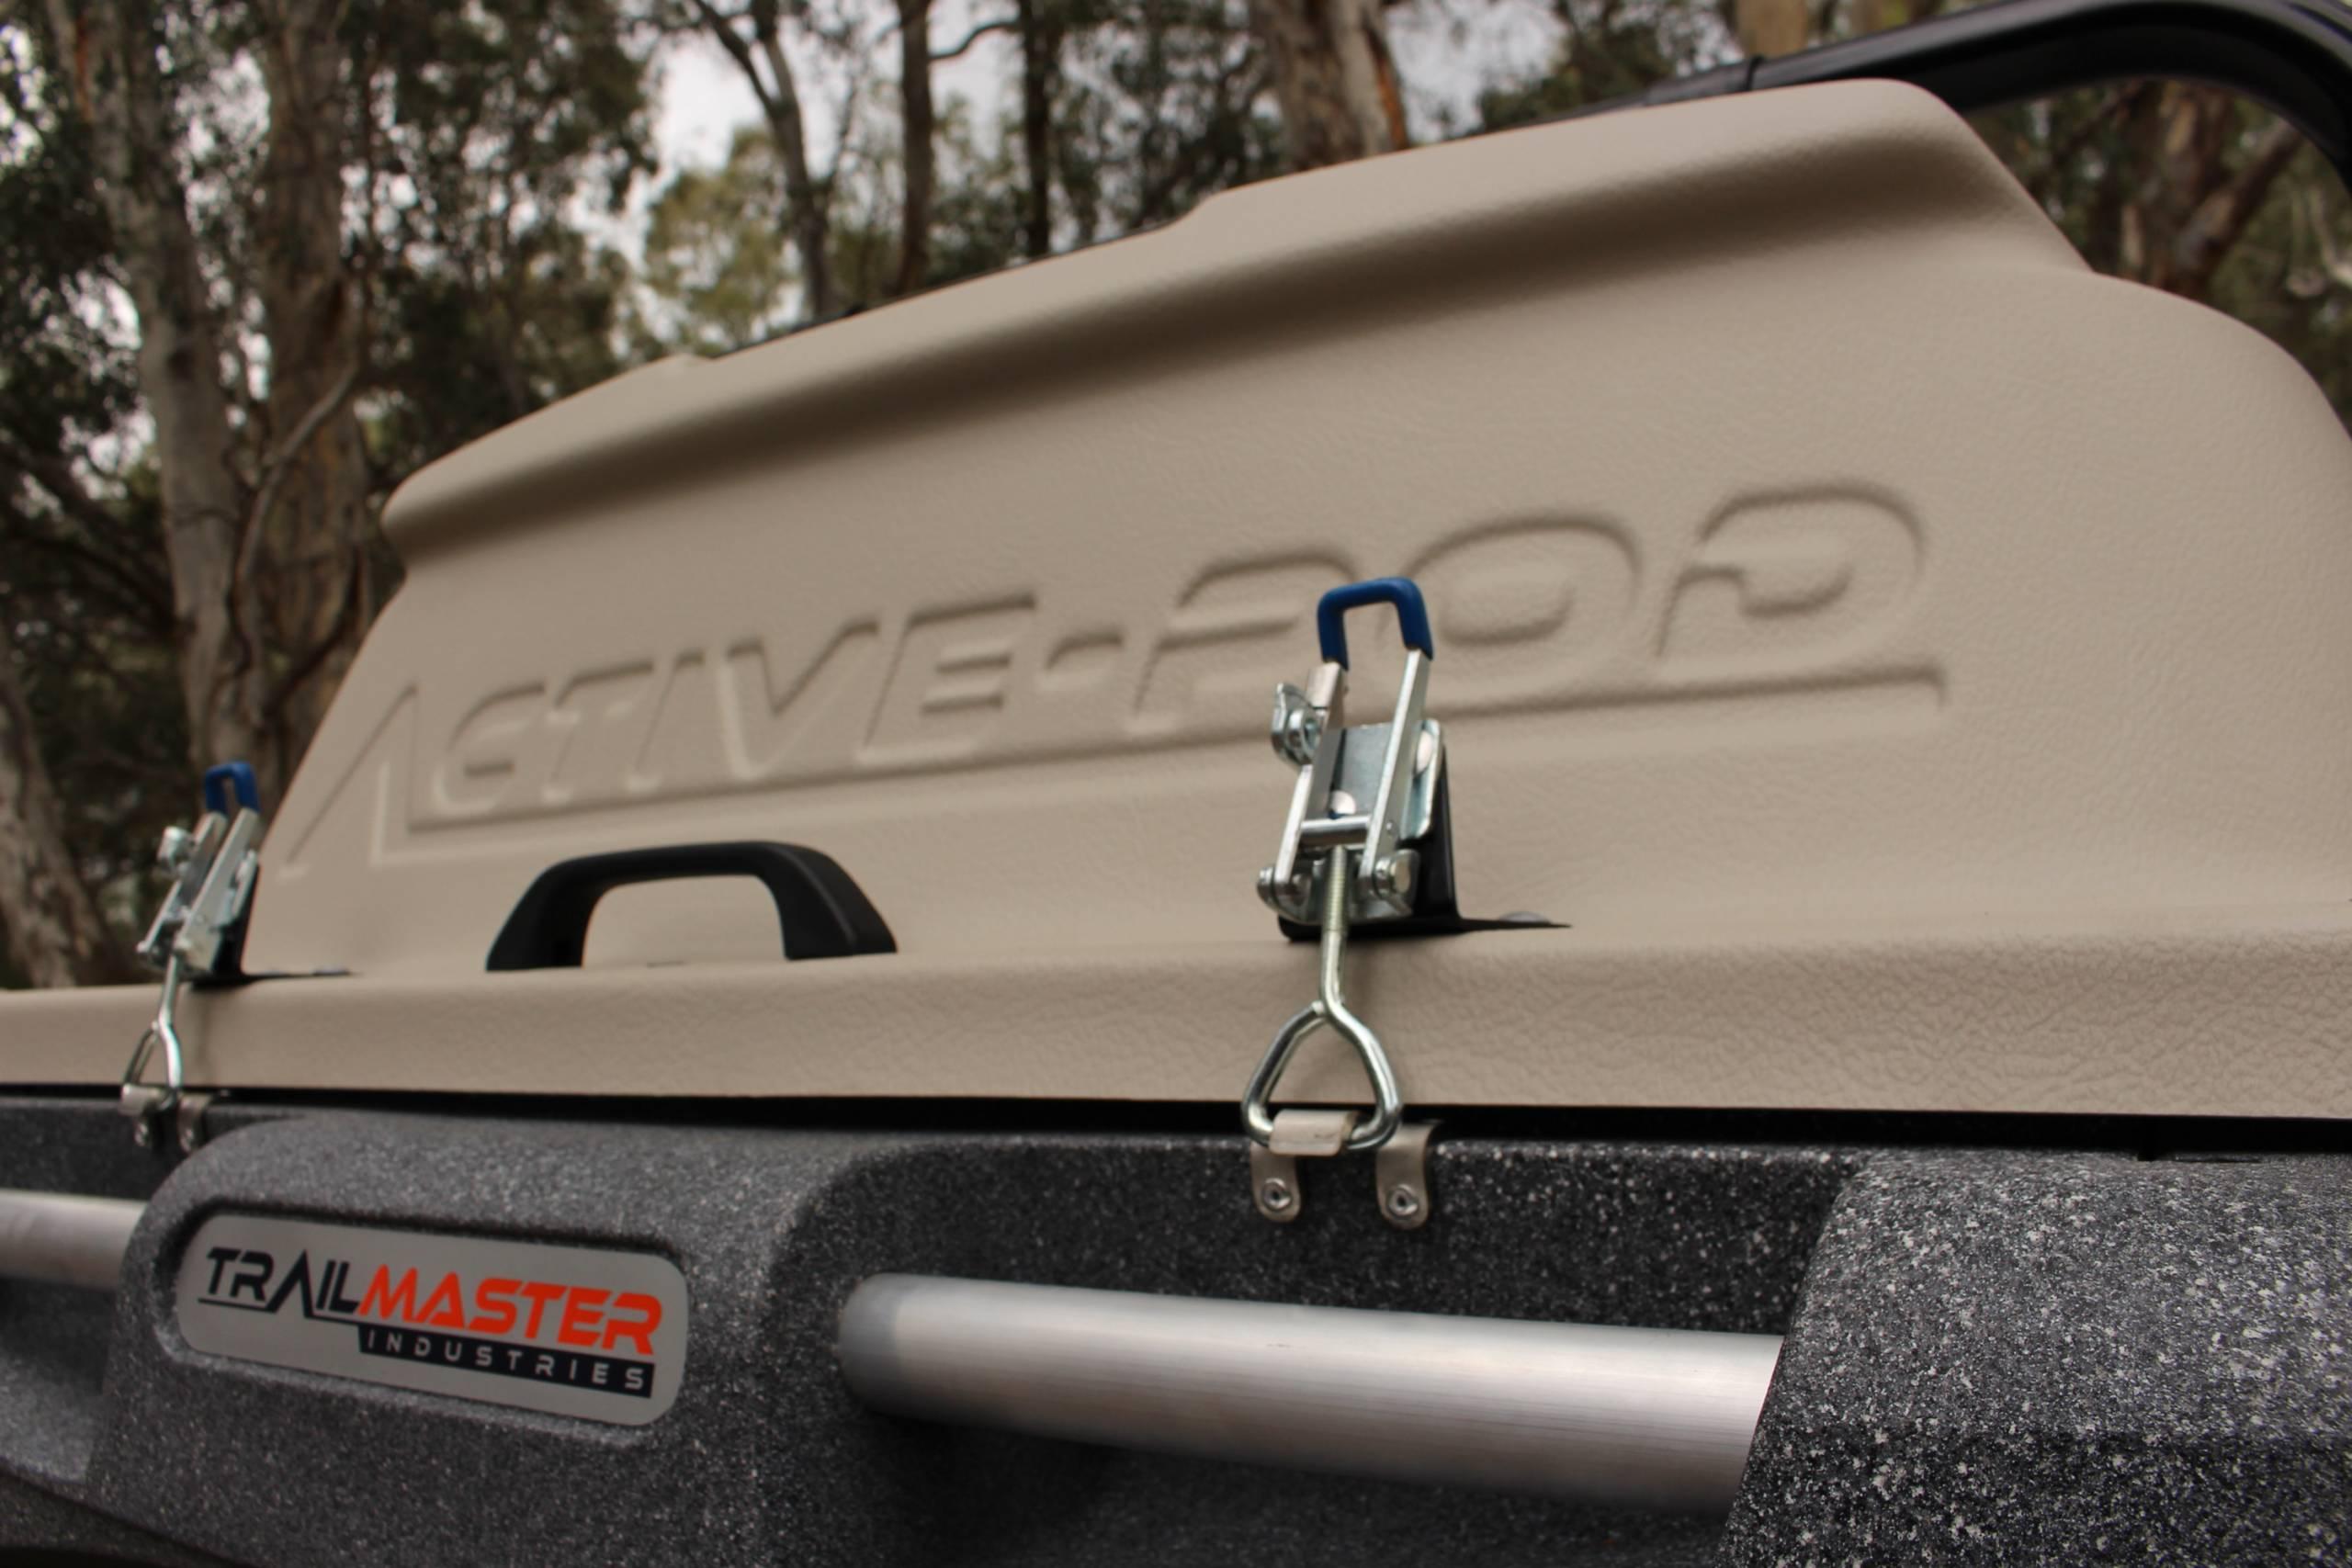 Trailmaster POD Trailer Locking system